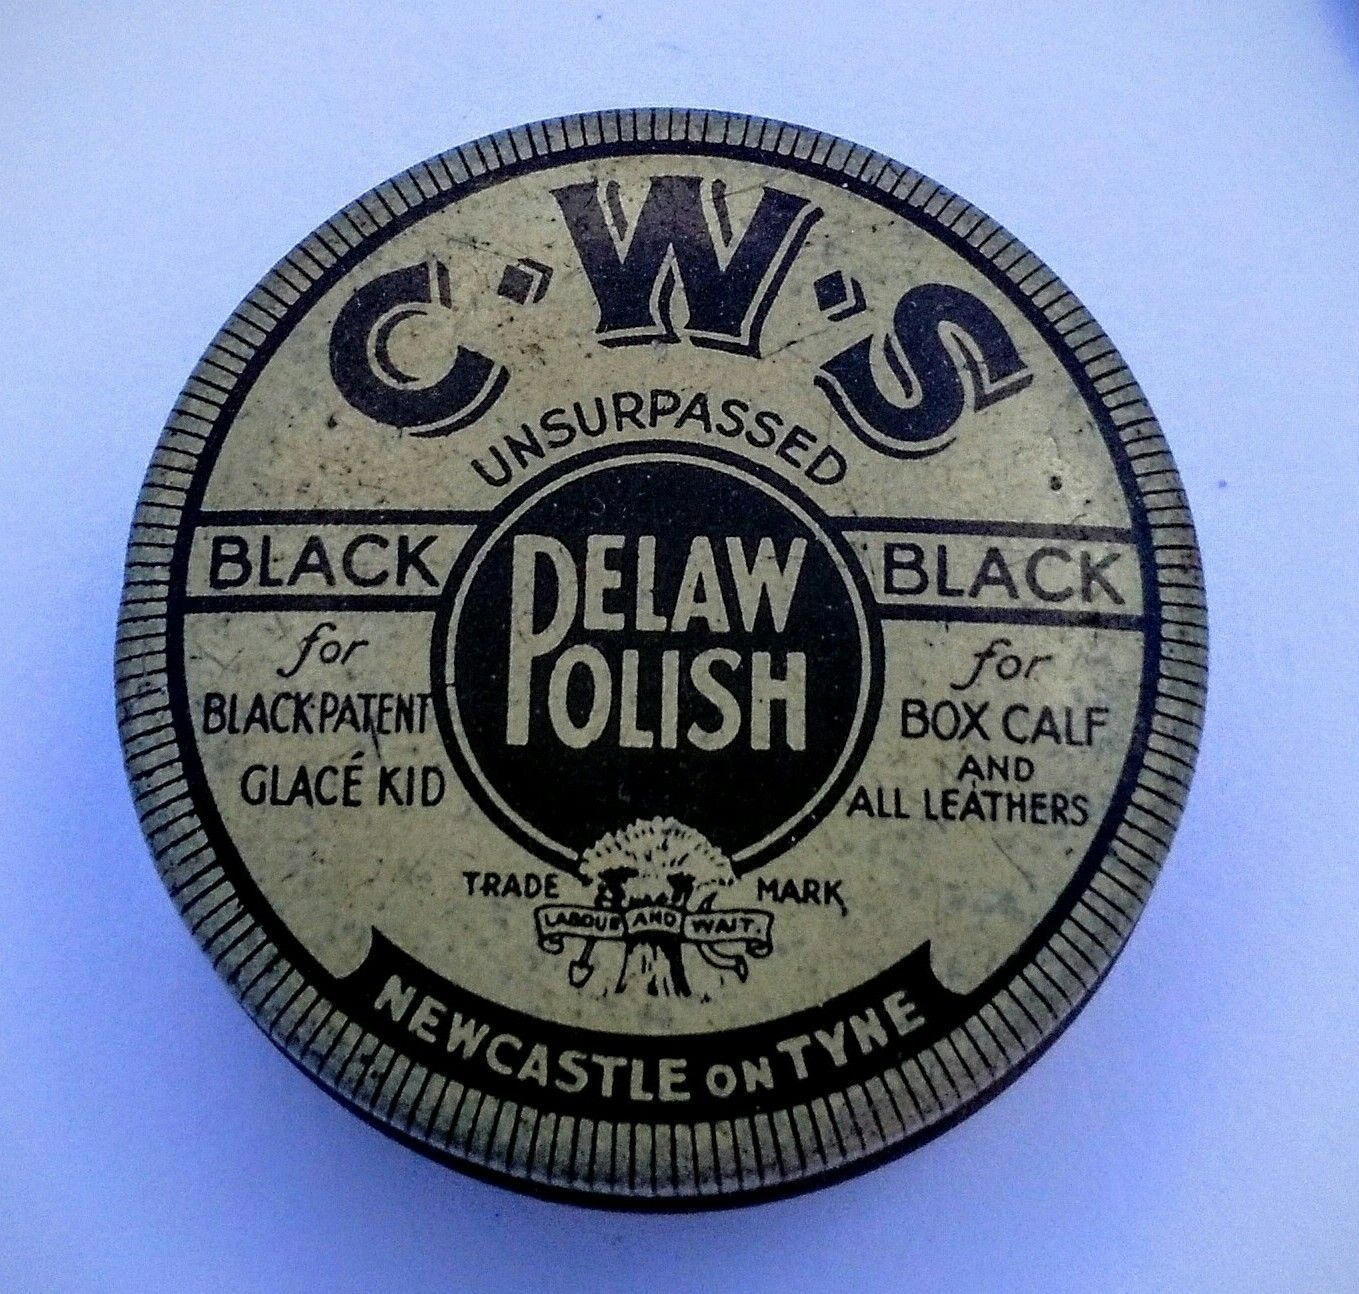 Vintage CWS Pelaw Polish Pencil Sharpner miniature advertising tin